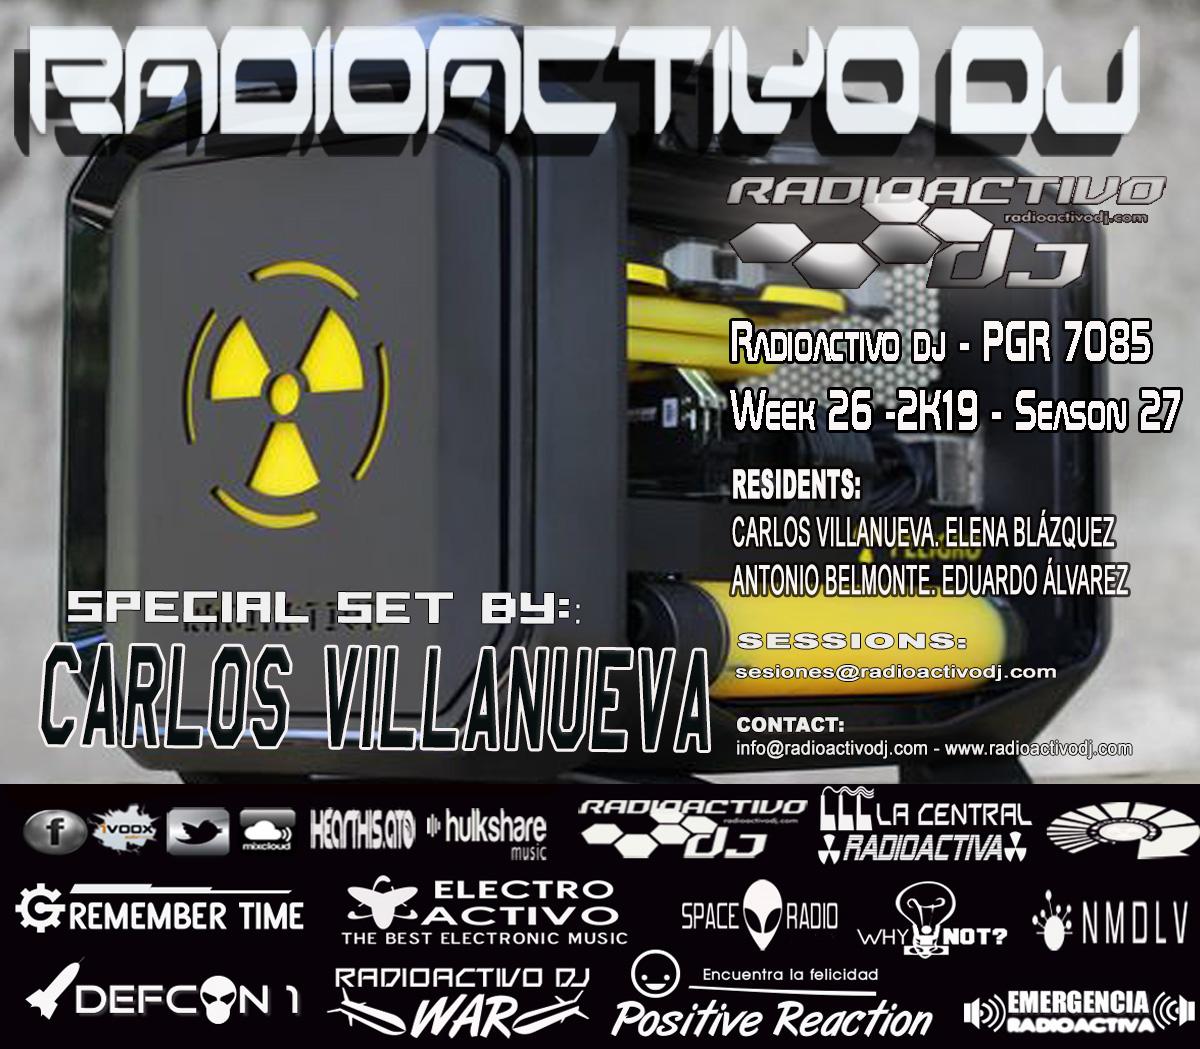 RADIOACTIVO-DJ-26-2019